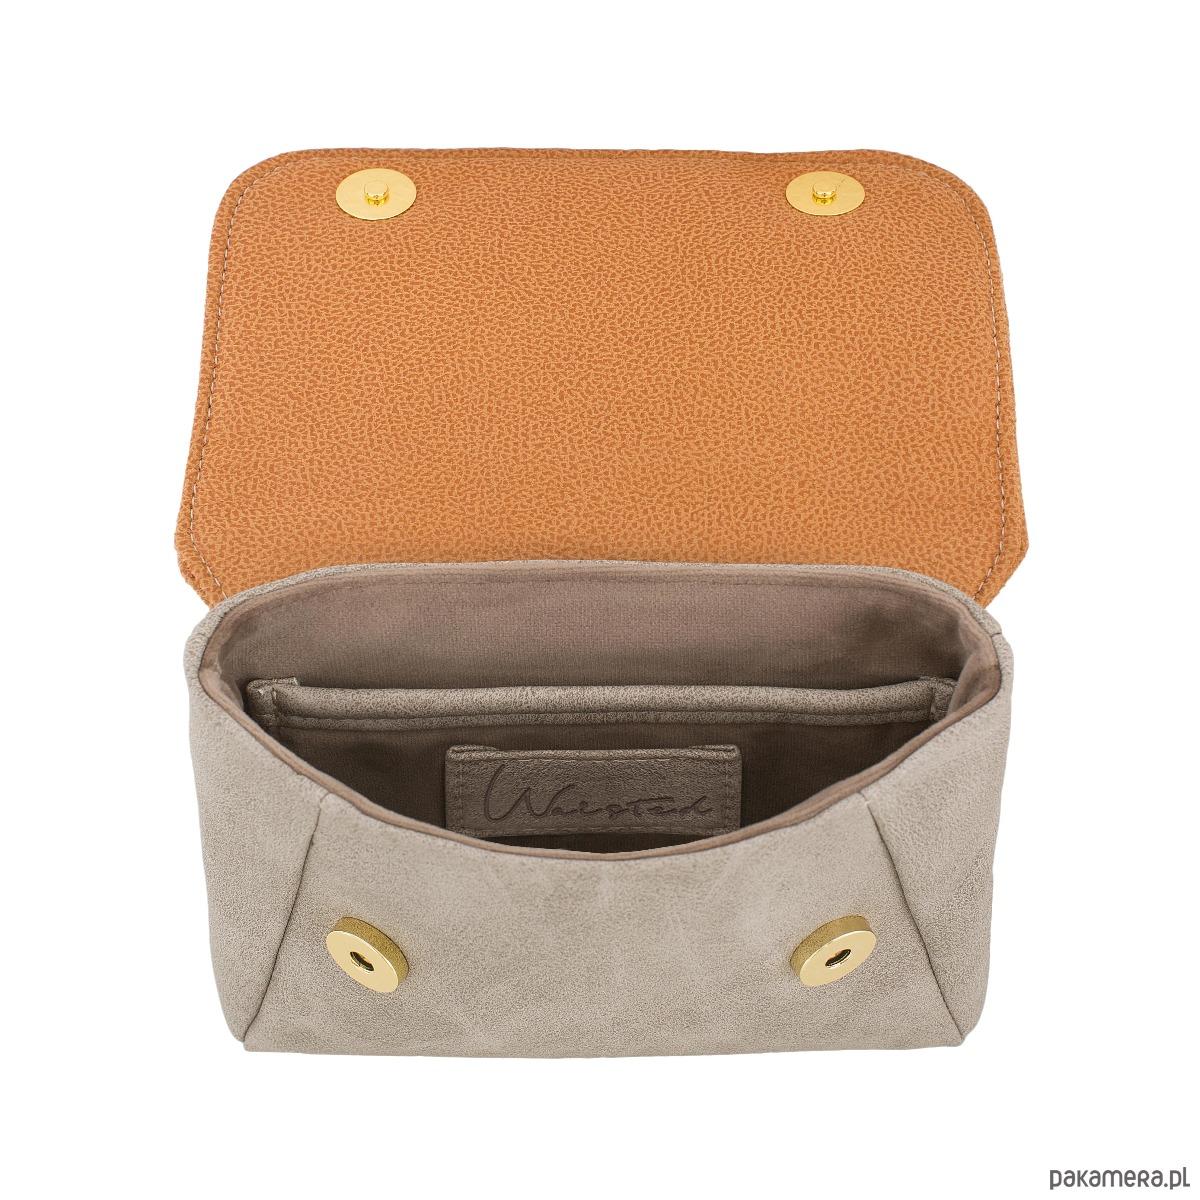 abde2dfa5e16b Waisted Small pomarańczowa torebka na biodro - nerki - damskie ...